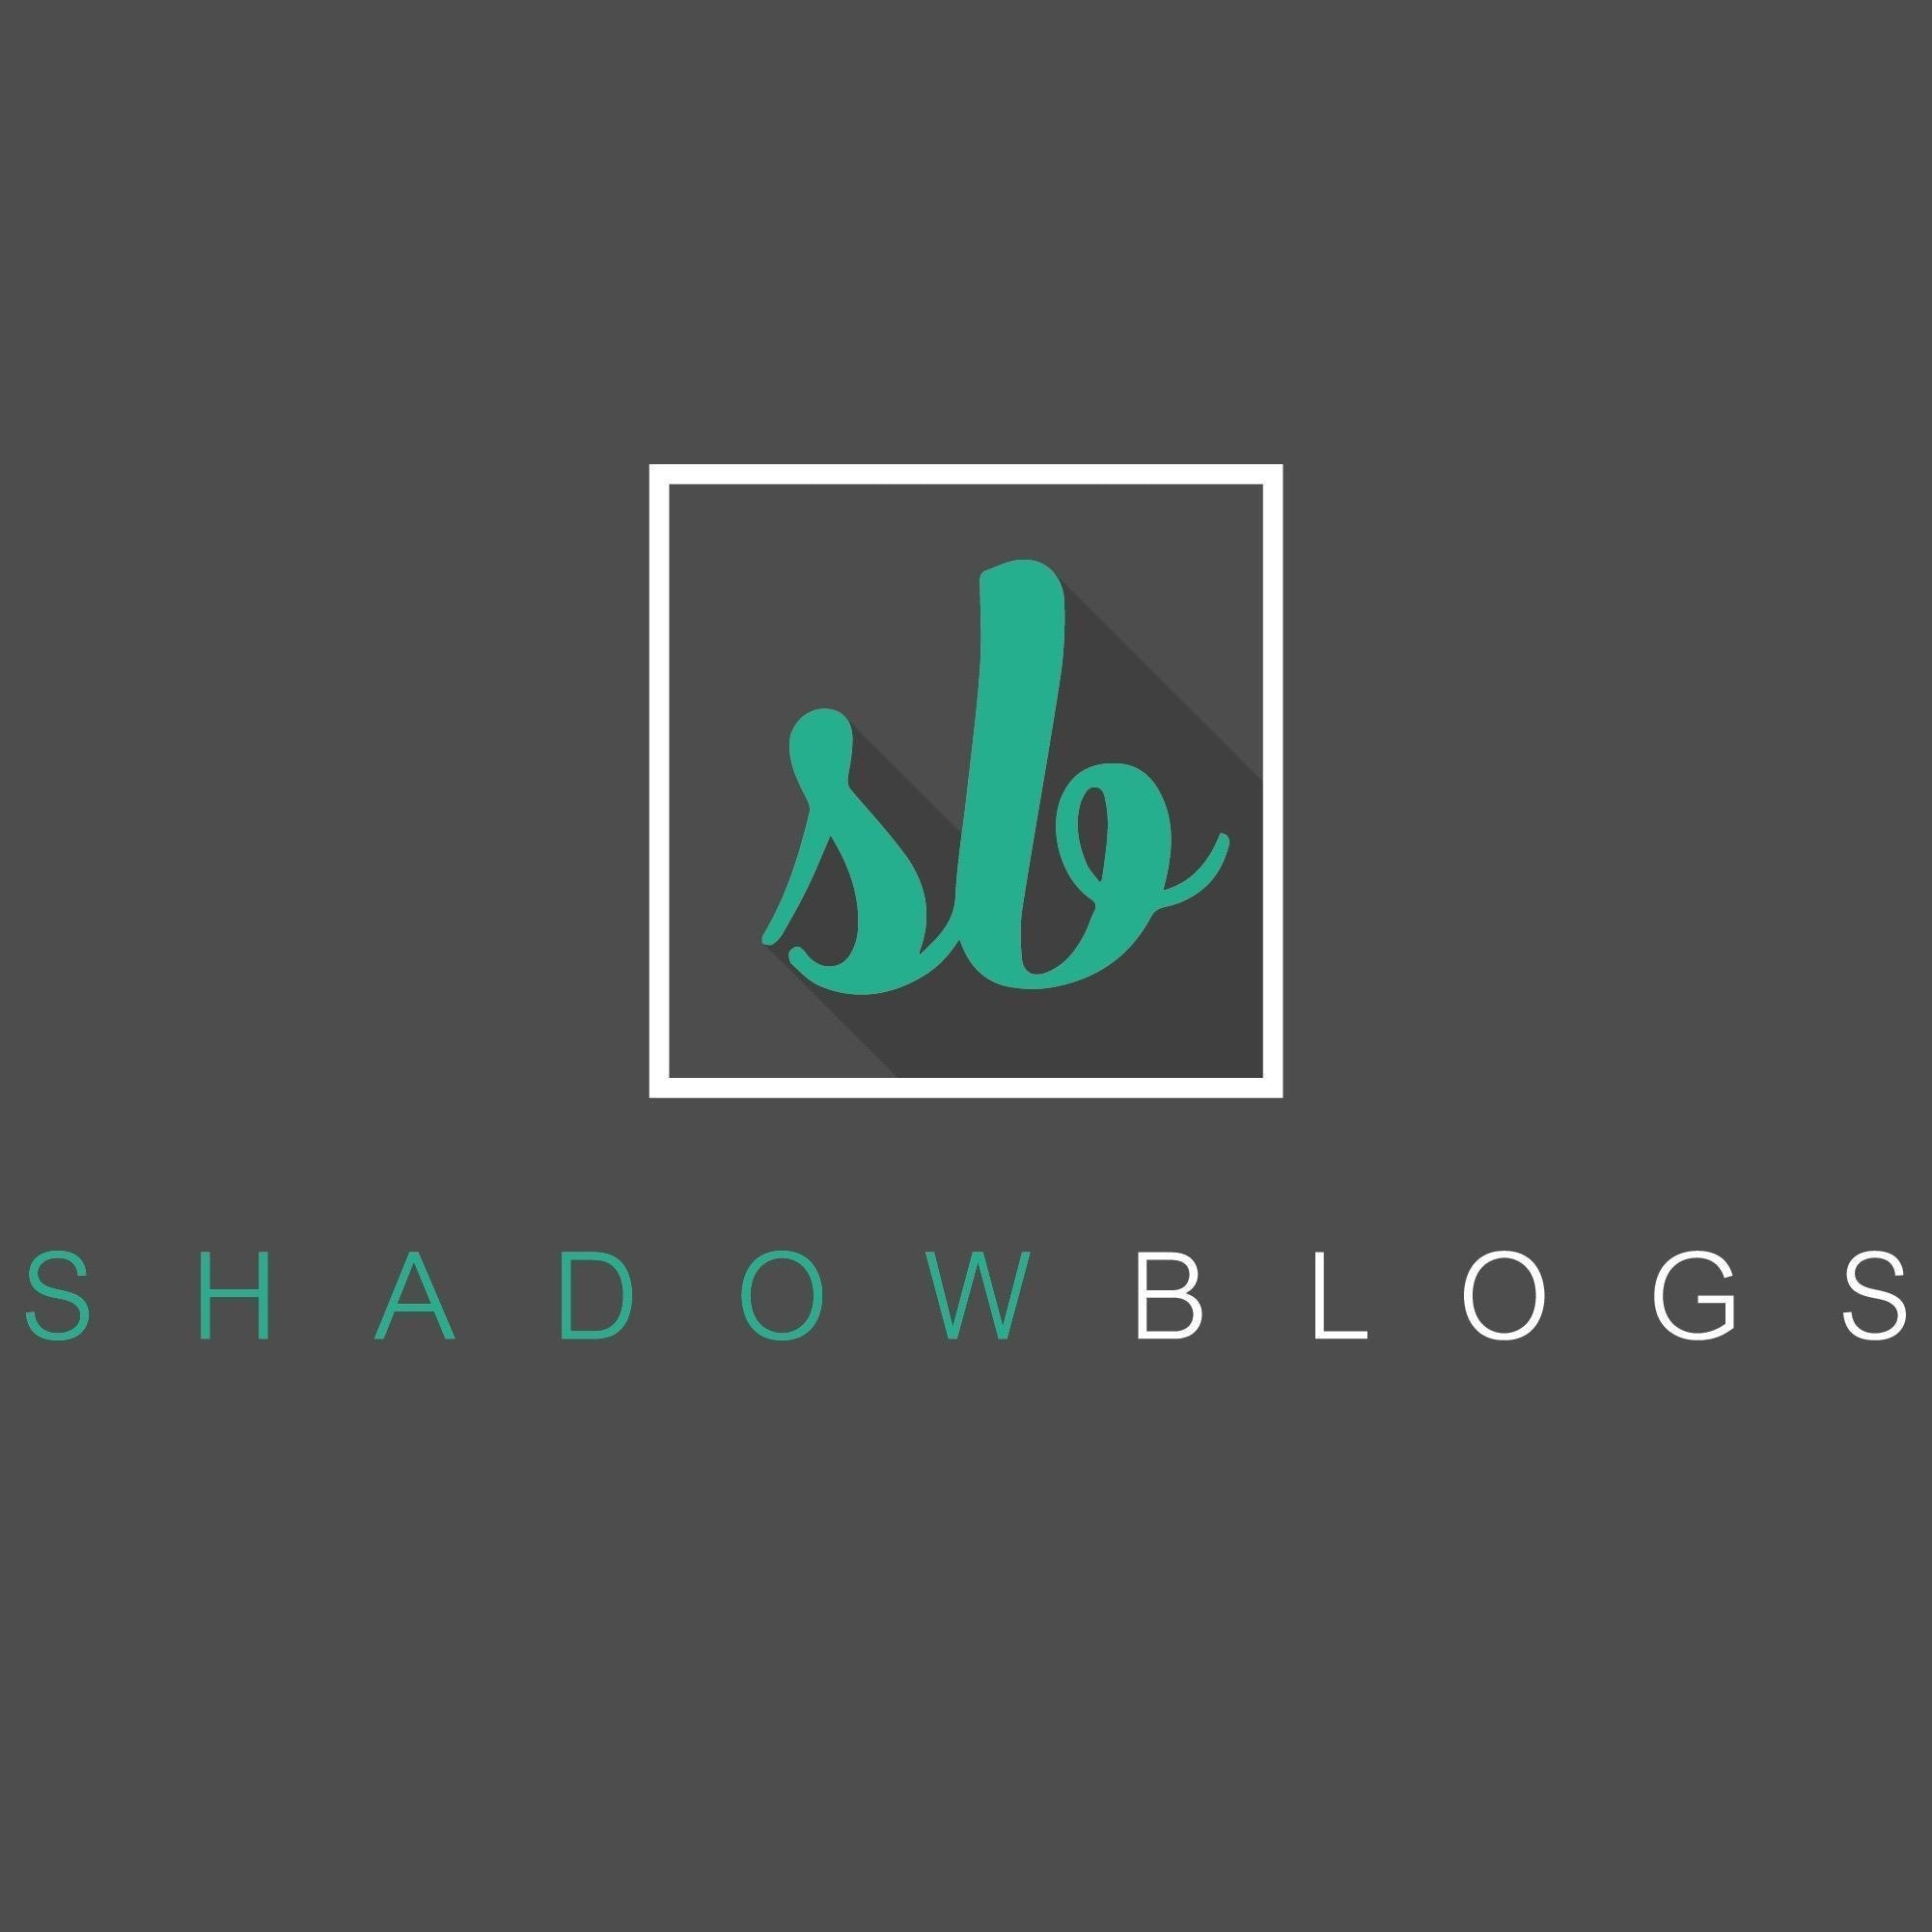 Shadowblogs